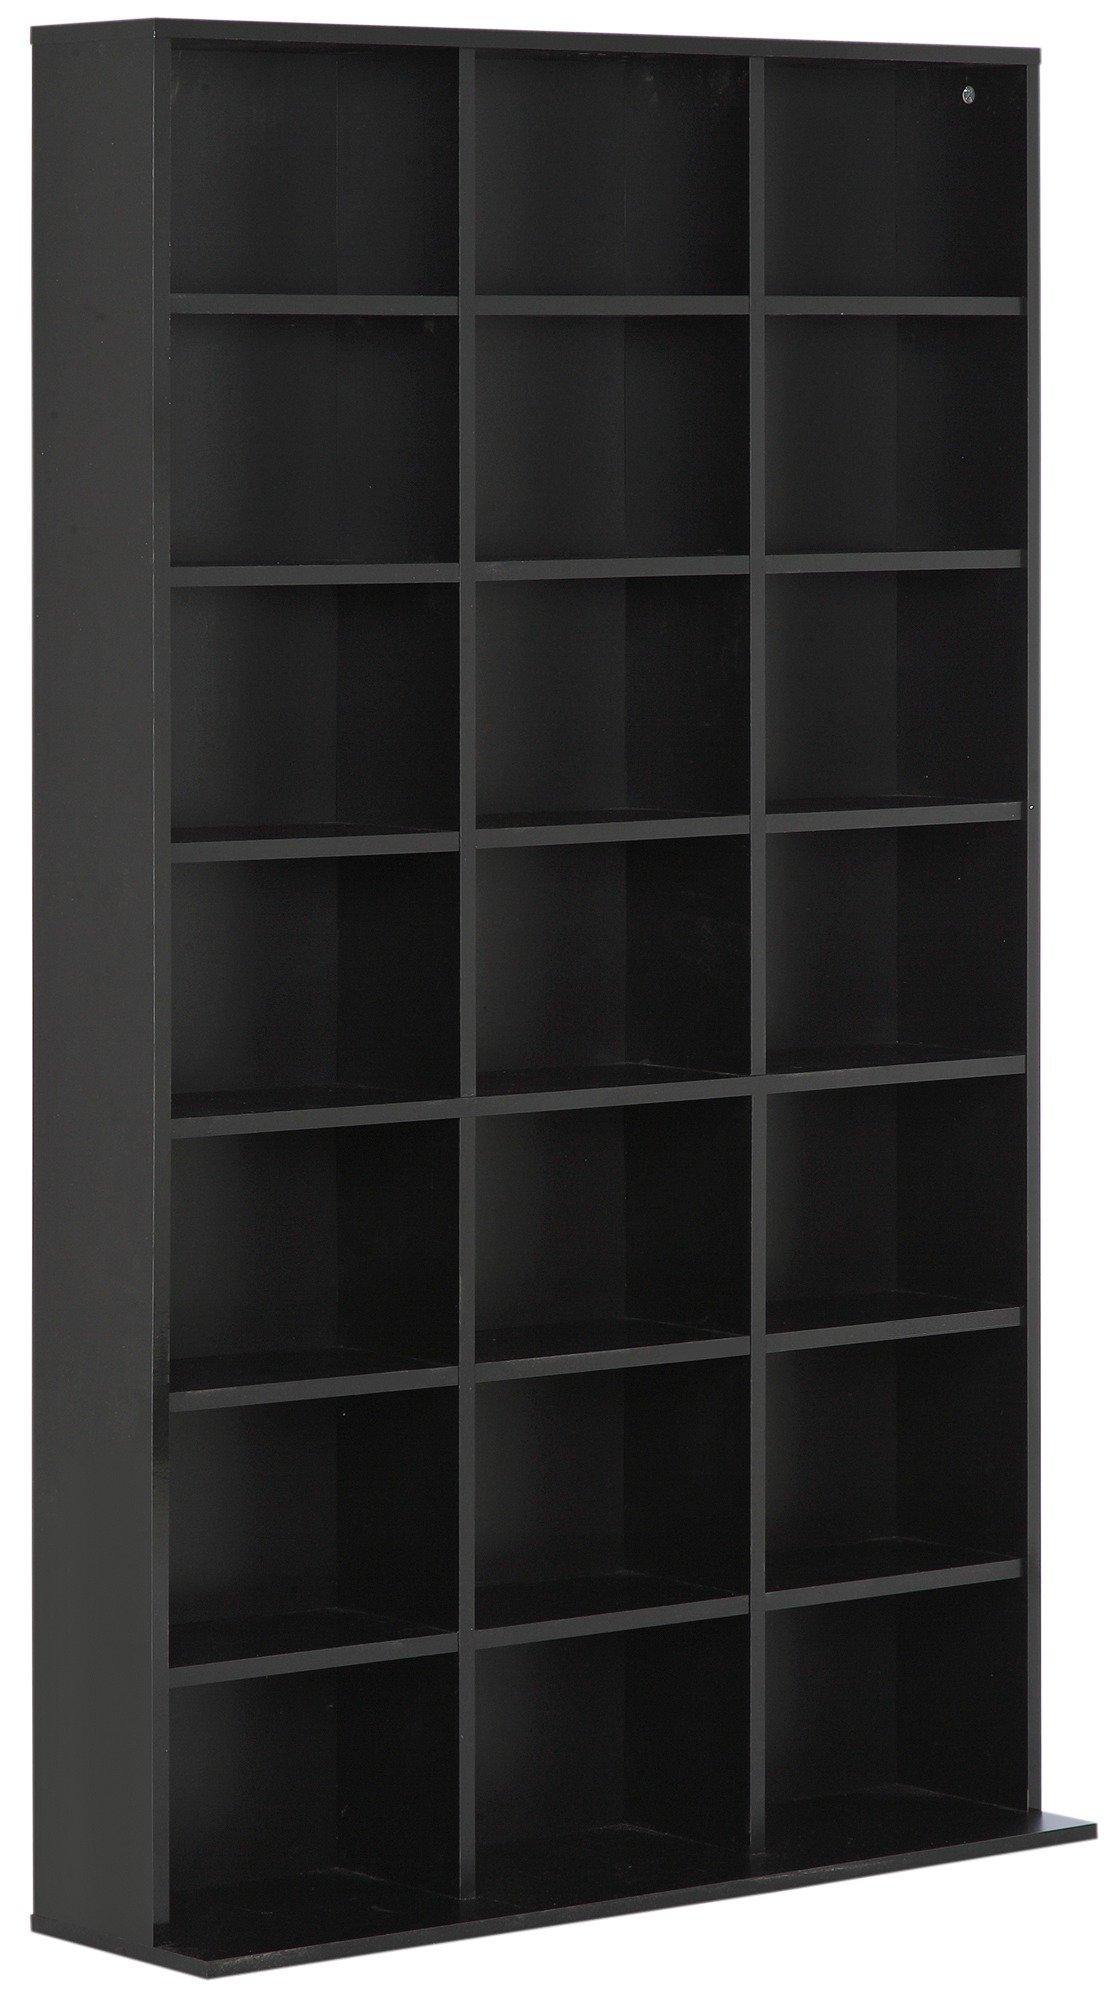 Hygena Jorvik DVD And CD Storage Unit   Gloss Black